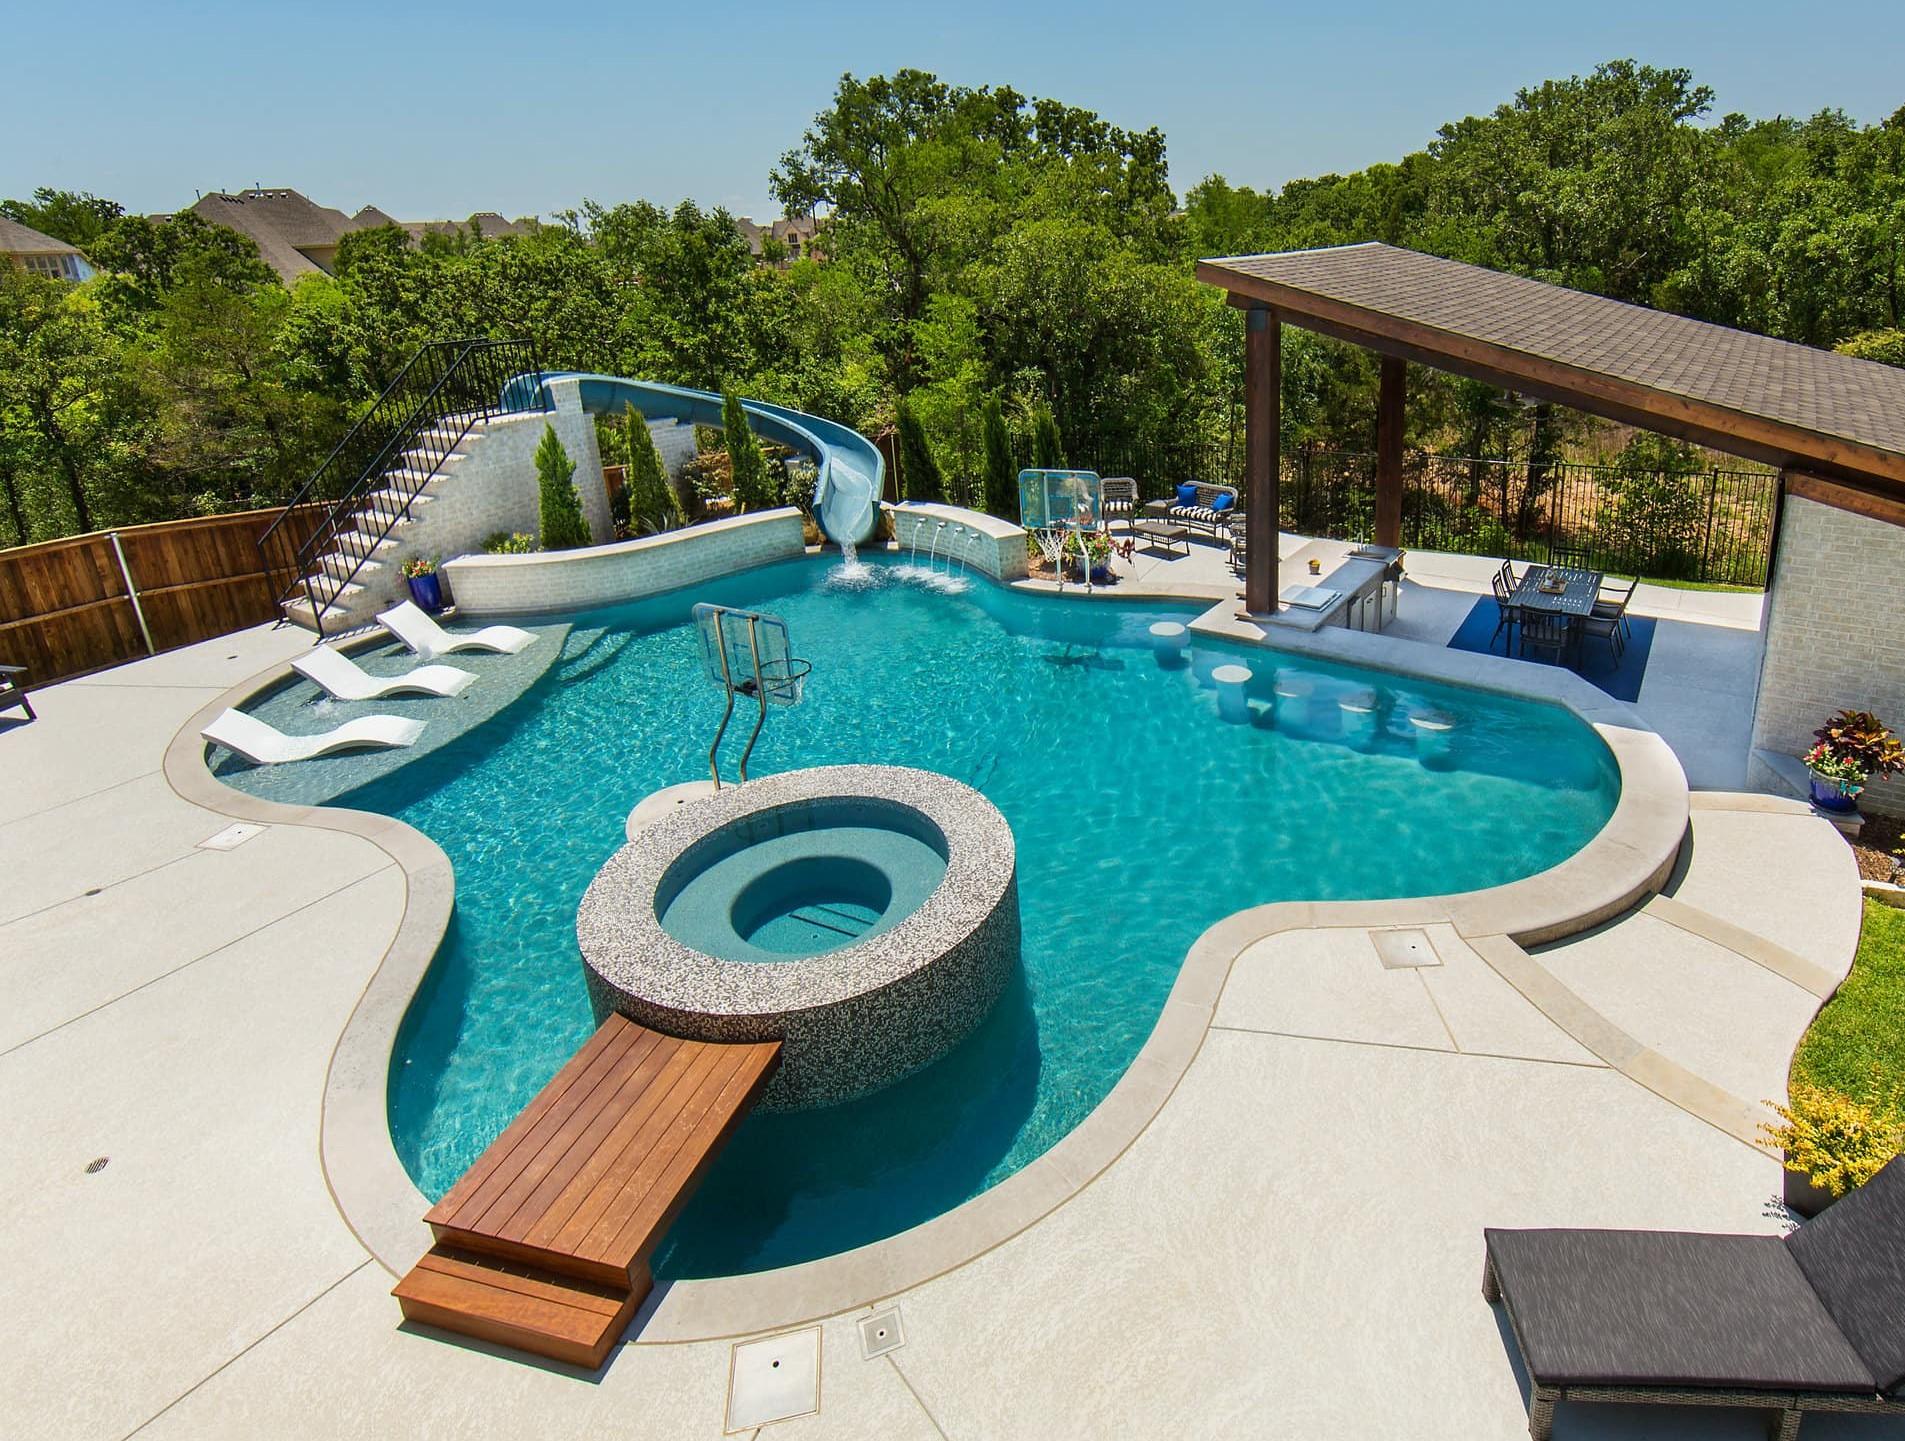 Texas Trophy Pools image 2